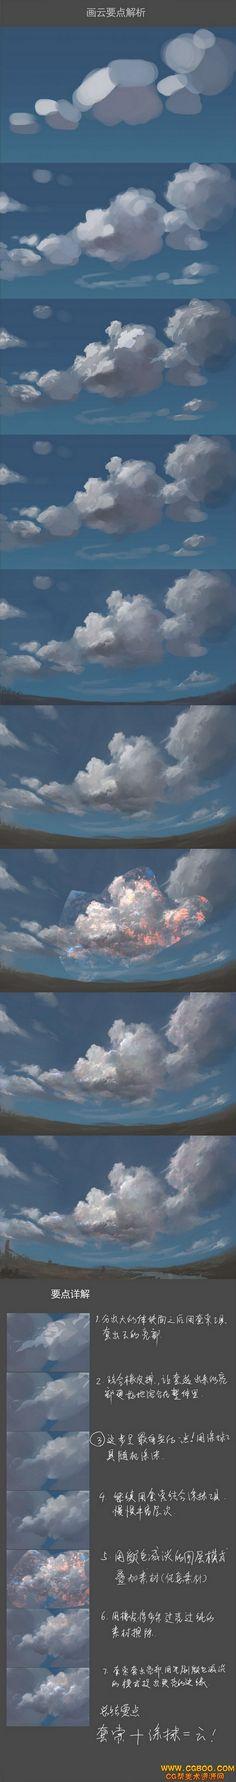 New Digital Art Tutorial Sky Ideas Digital Painting Tutorials, Digital Art Tutorial, Art Tutorials, Doodle Drawing, Cloud Drawing, Cloud Art, Poses References, Process Art, Painting Process